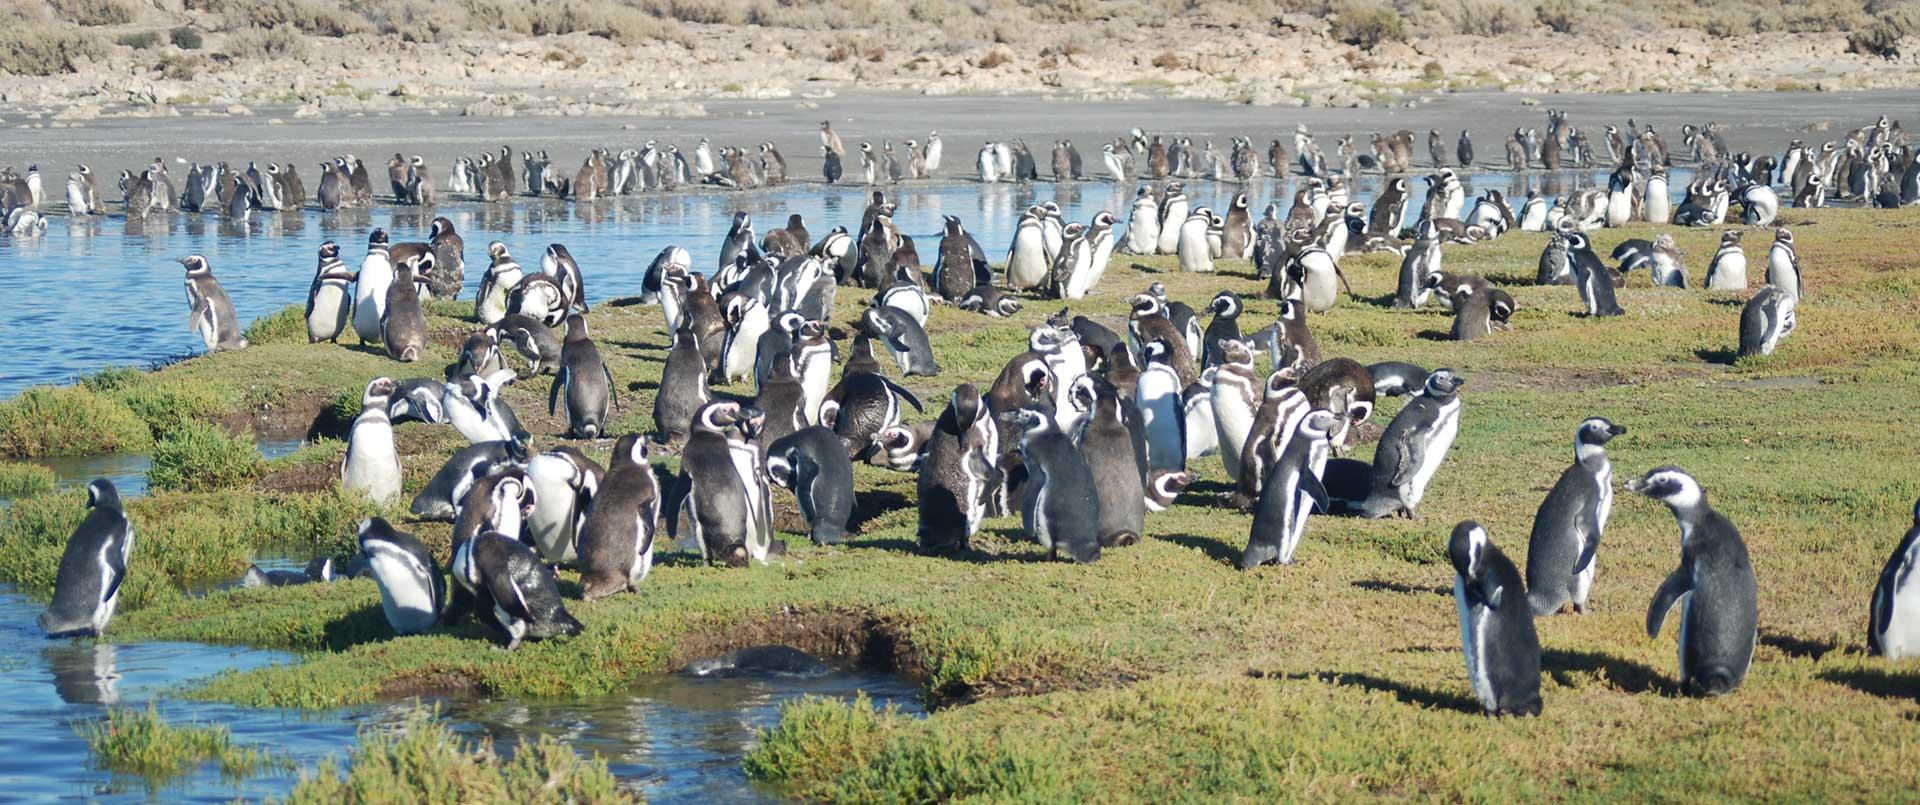 Bahia Bustamante, Chubut, Patagonia